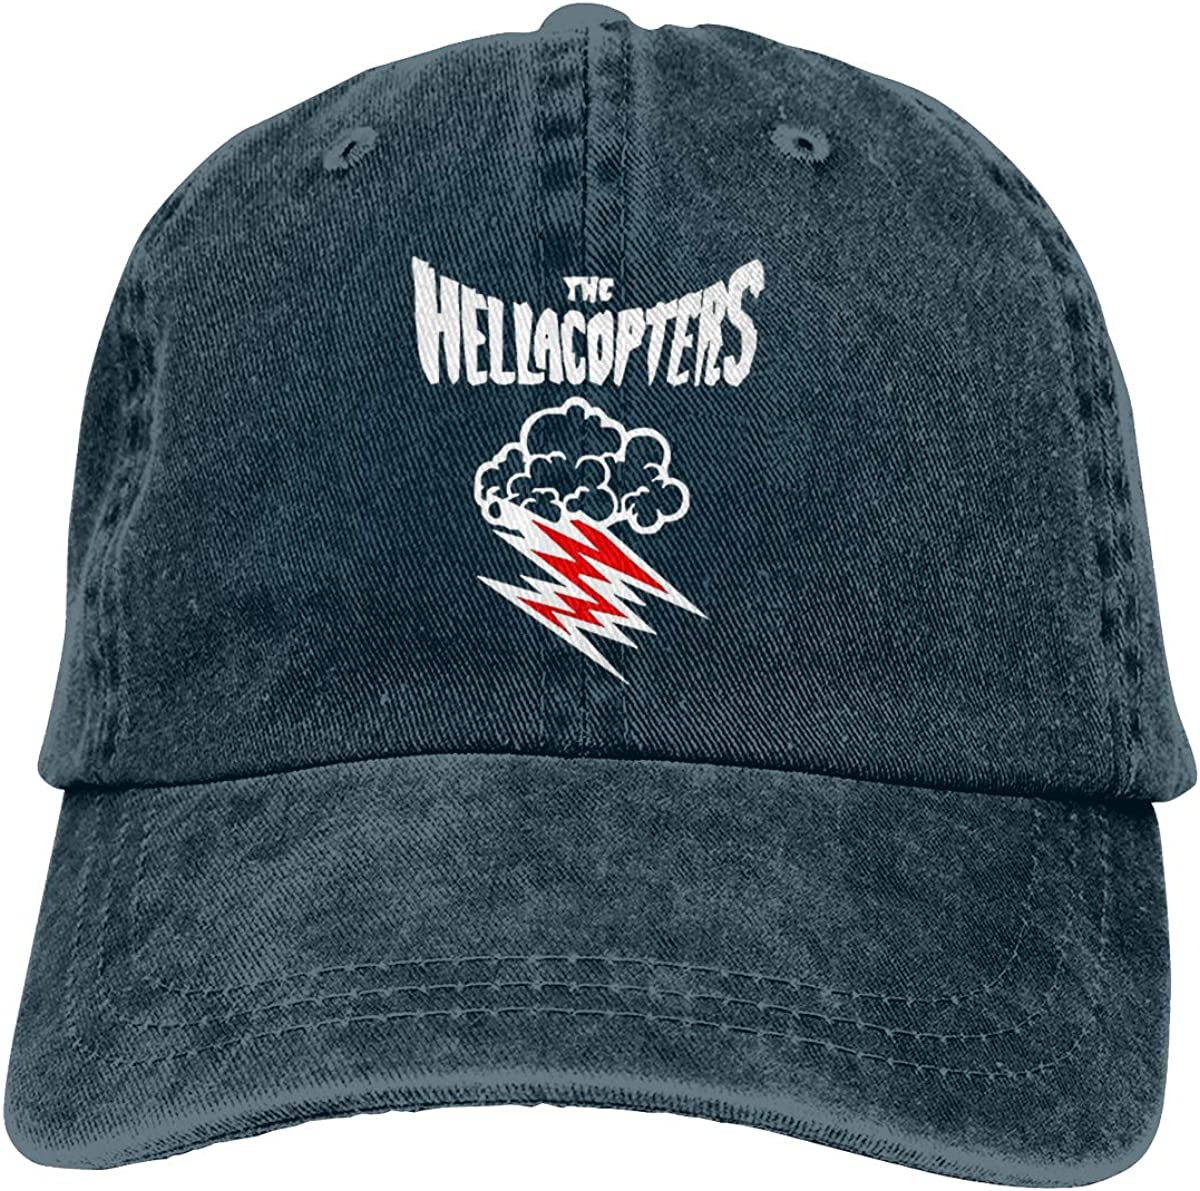 Zlizhi Hellacopters Men Women Plain Cotton Adjustable Washed Twill Low Profile Baseball Cap Hat